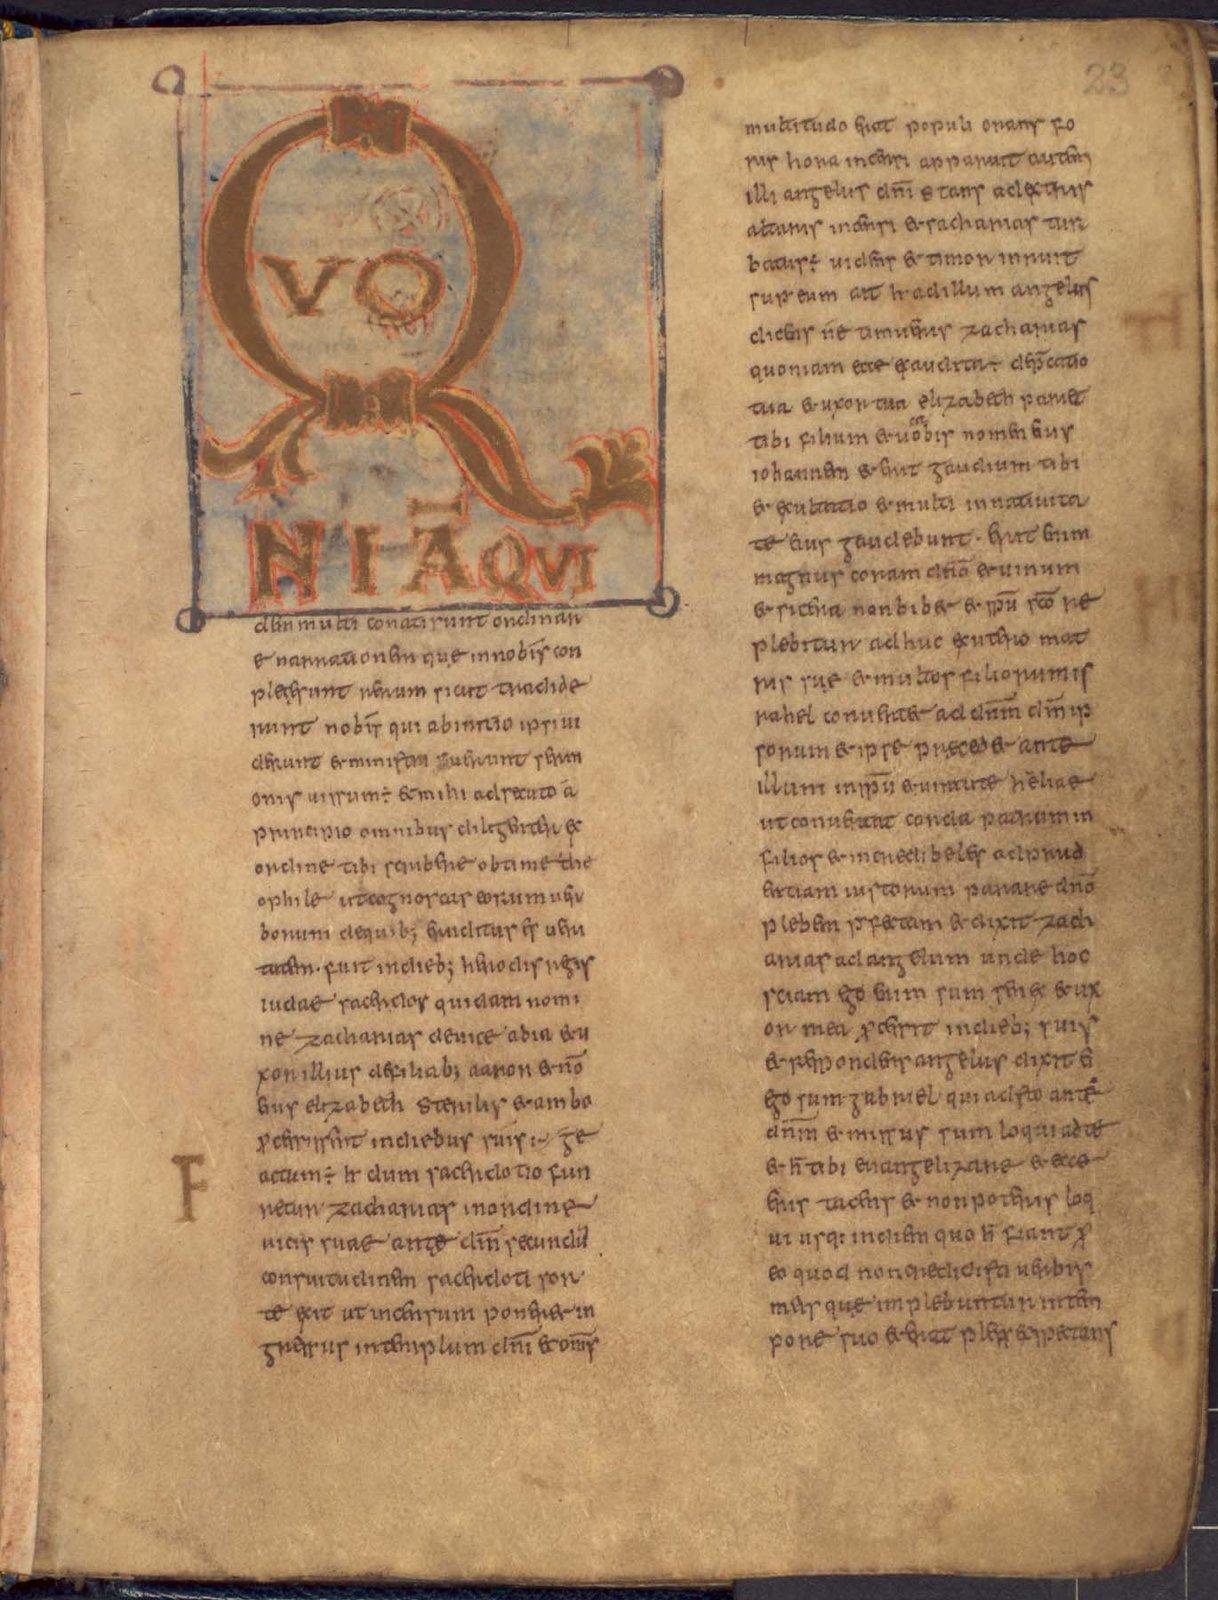 Incipit of Luke's Gospel from BL Add 40618, f. 23